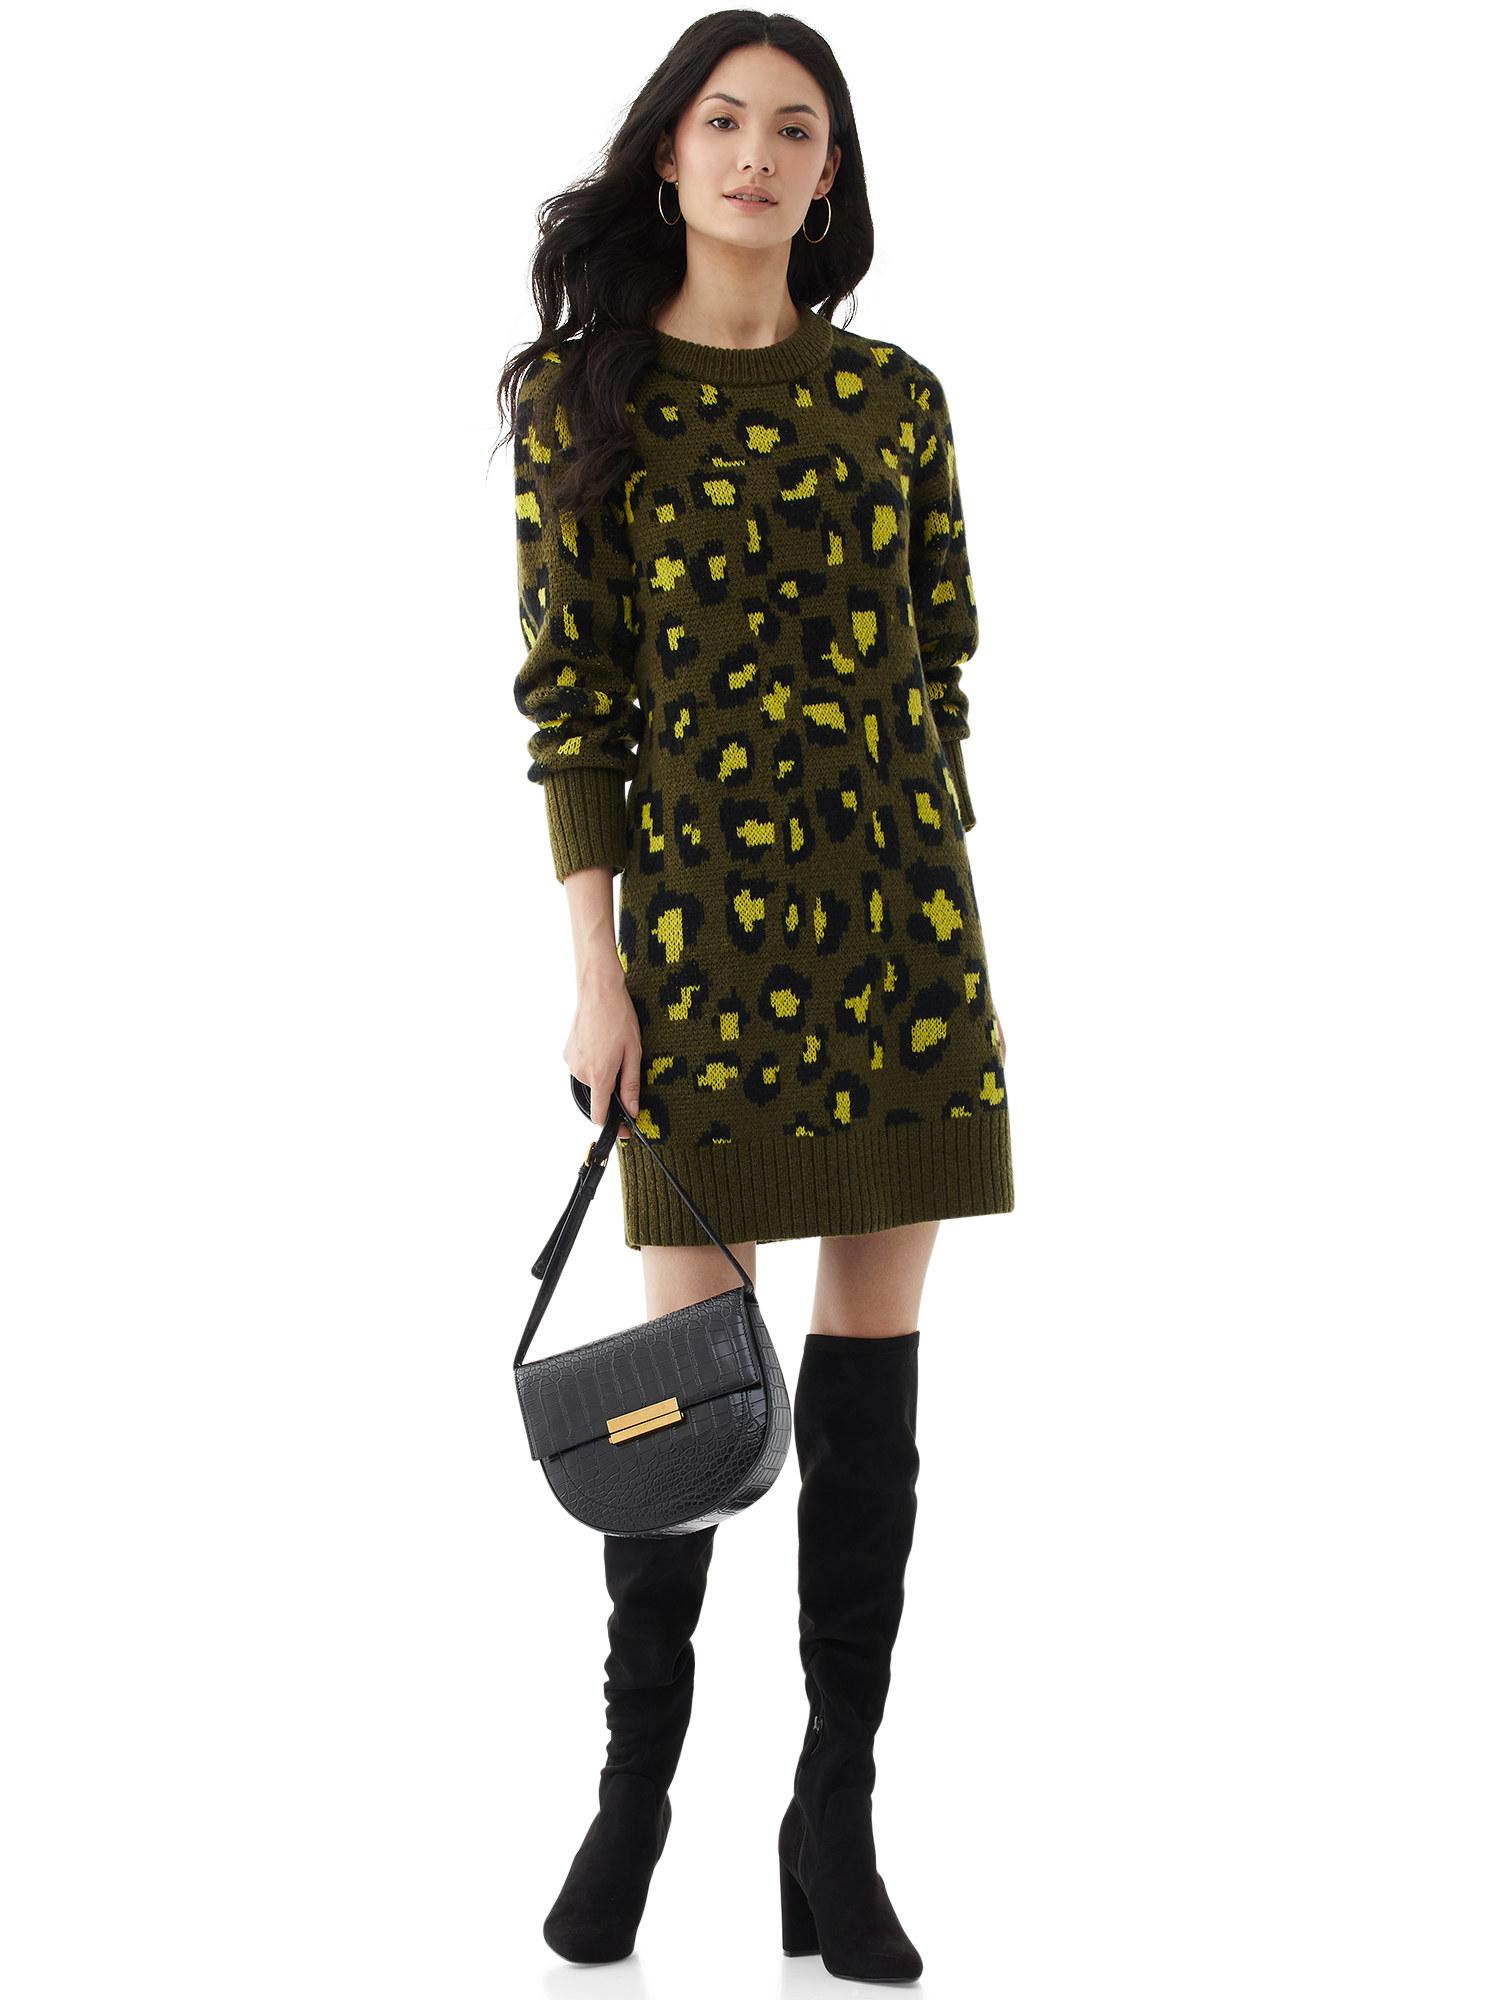 person wearing a green leopard print sweater dress